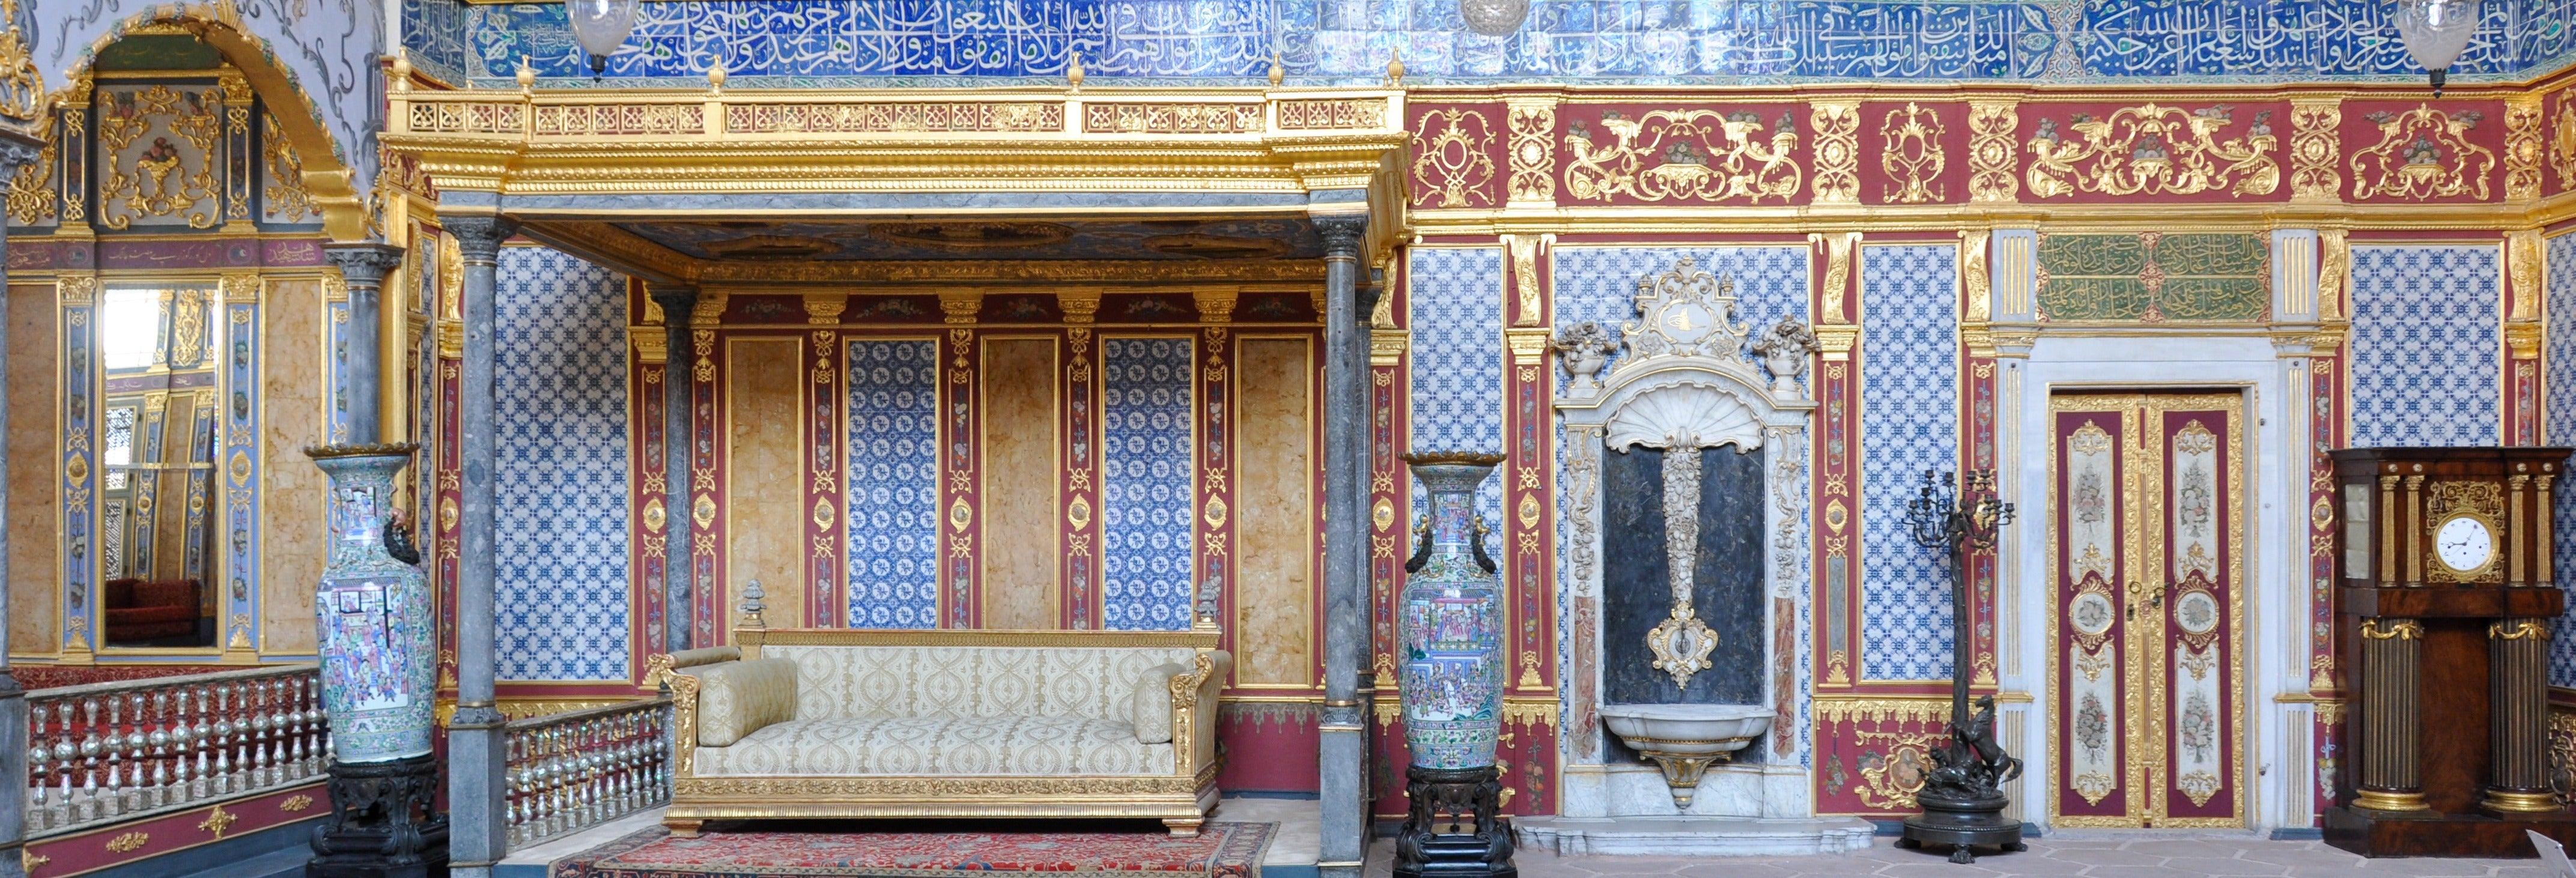 Free tour por el Palacio de Topkapi